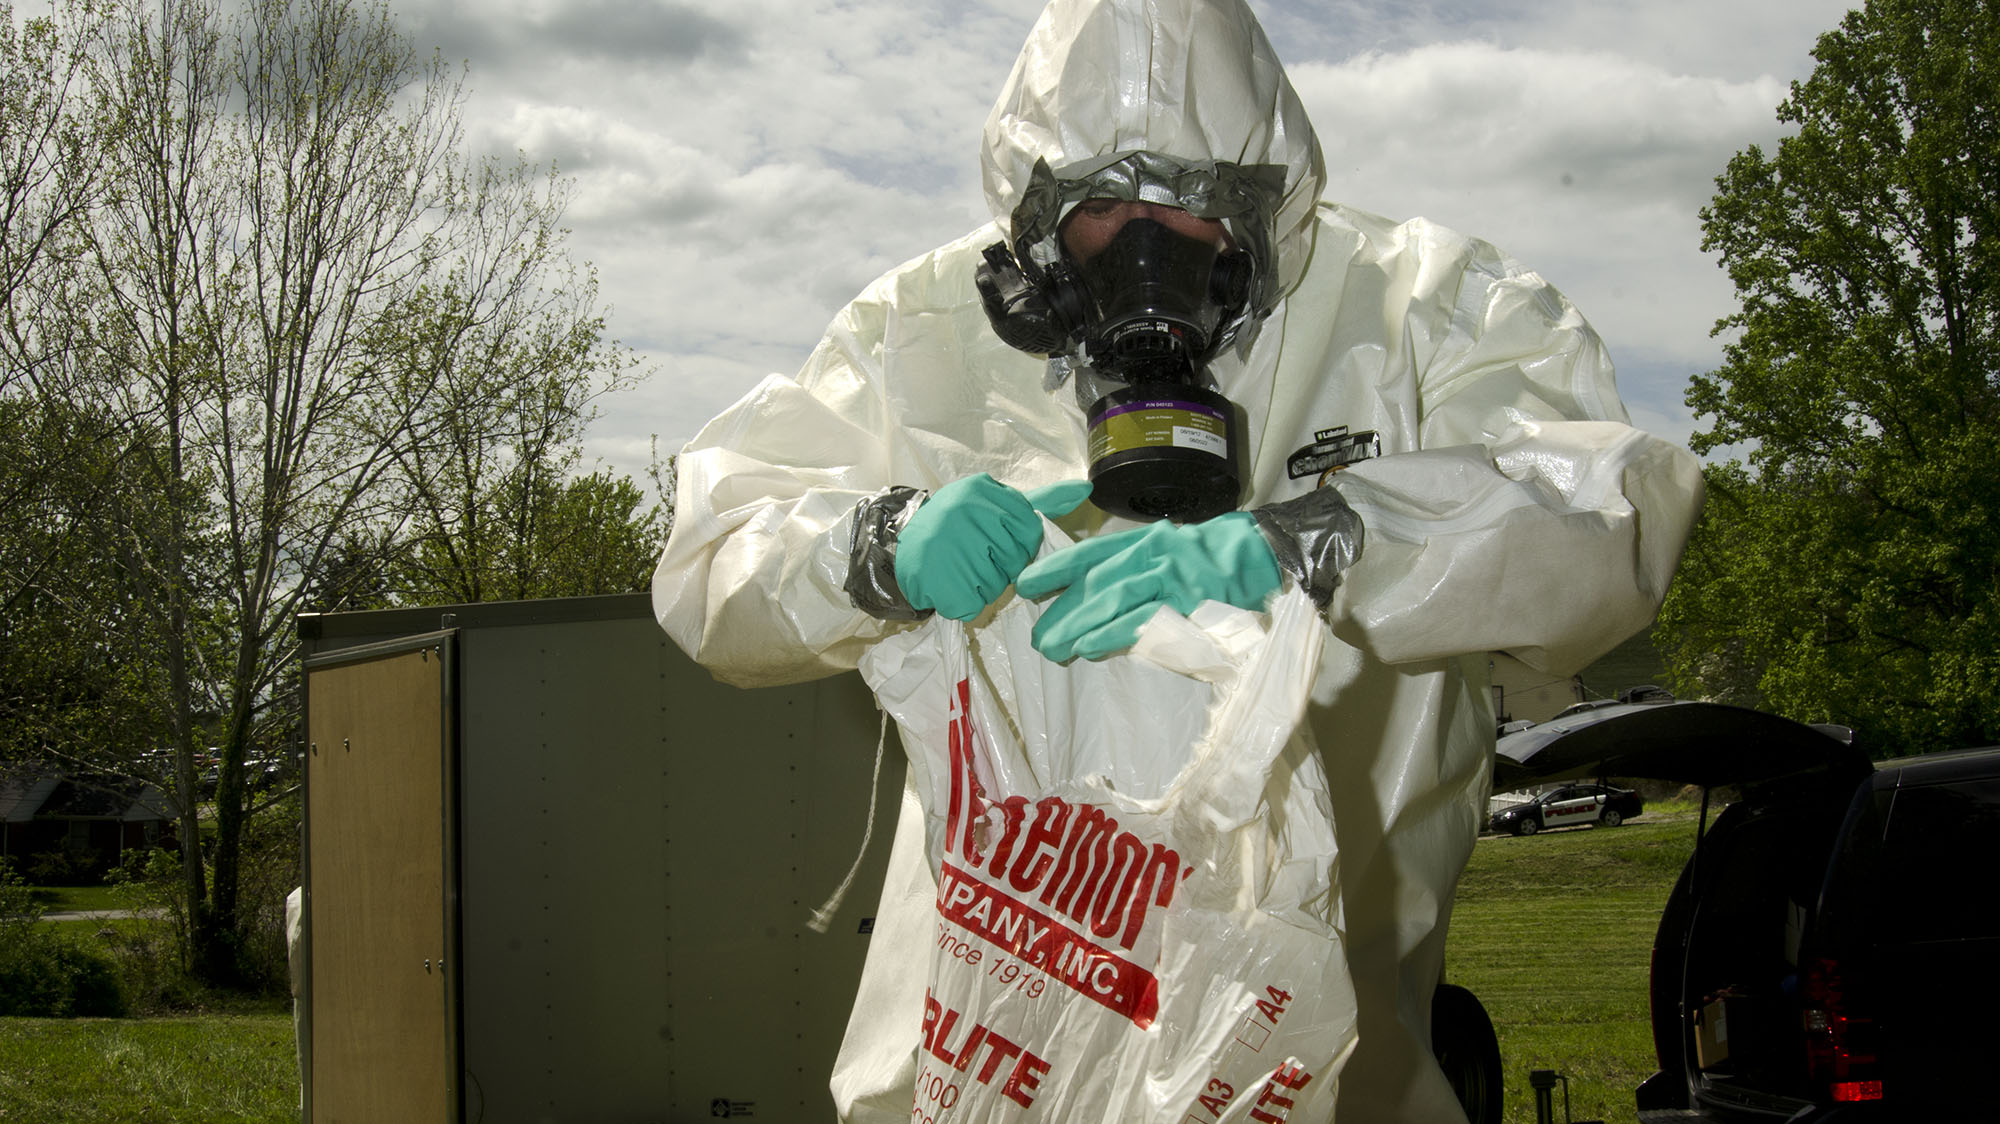 Meth lab smell burning plastic